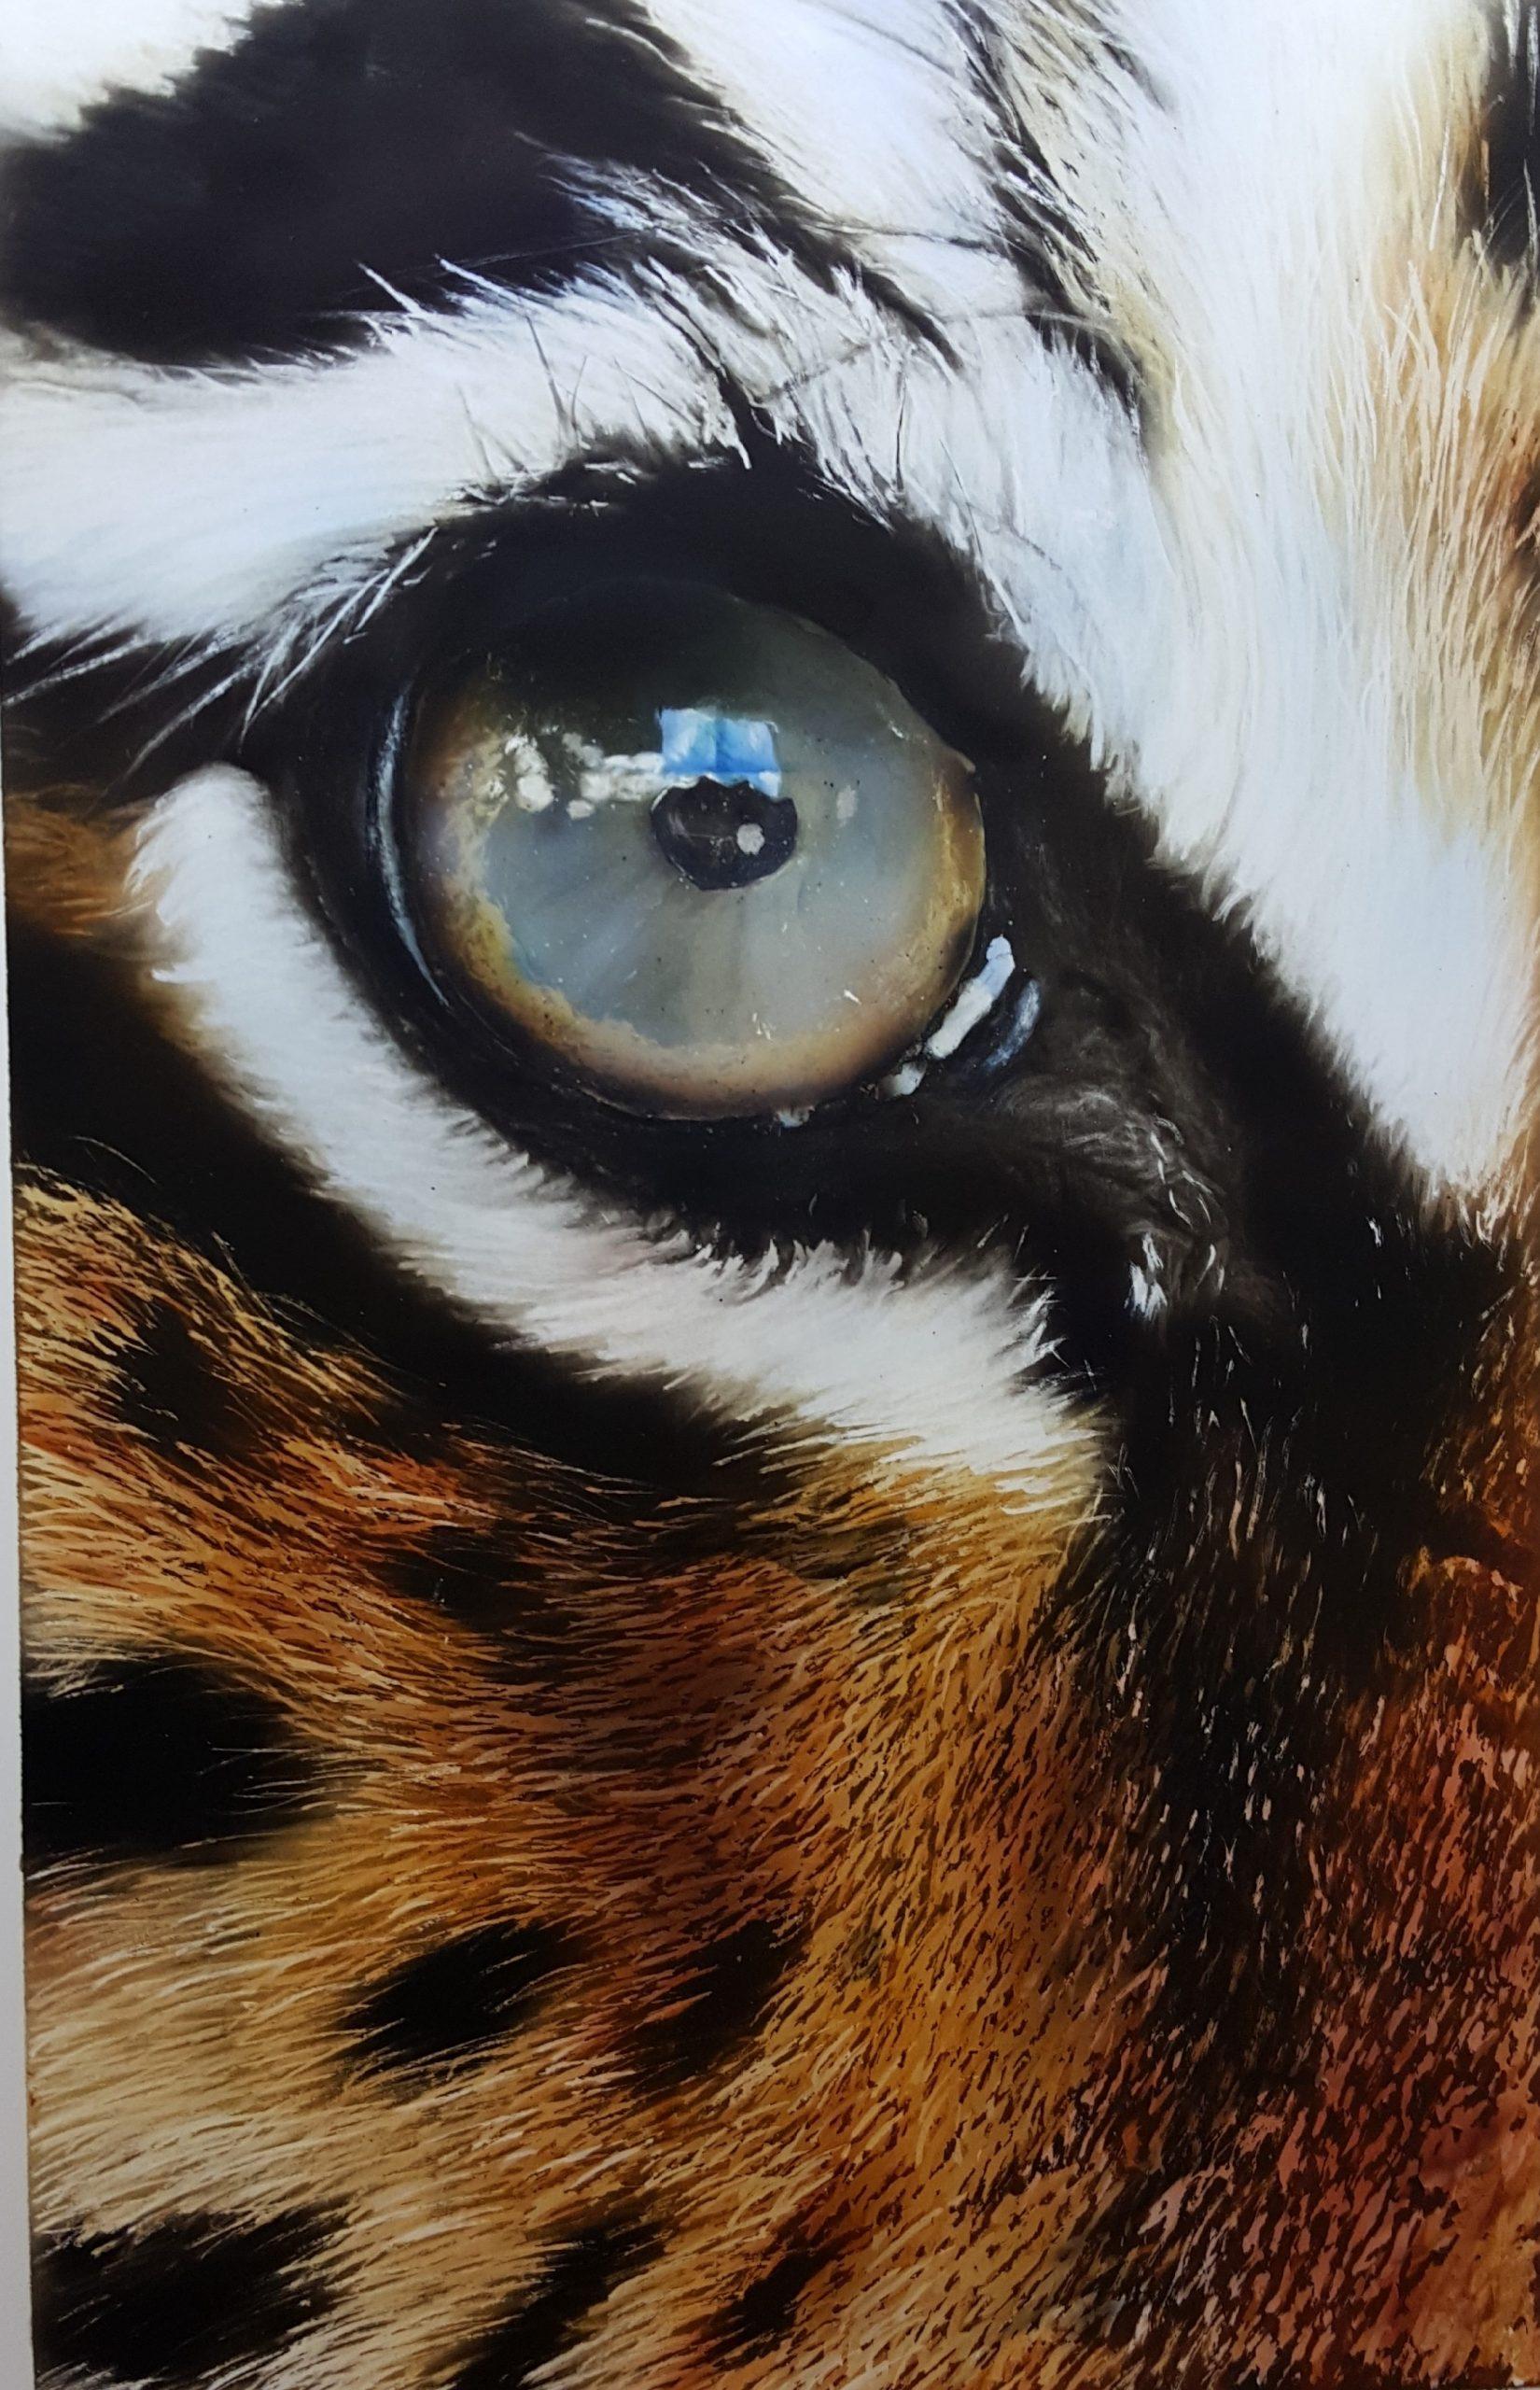 œil de tigre a l aérographe